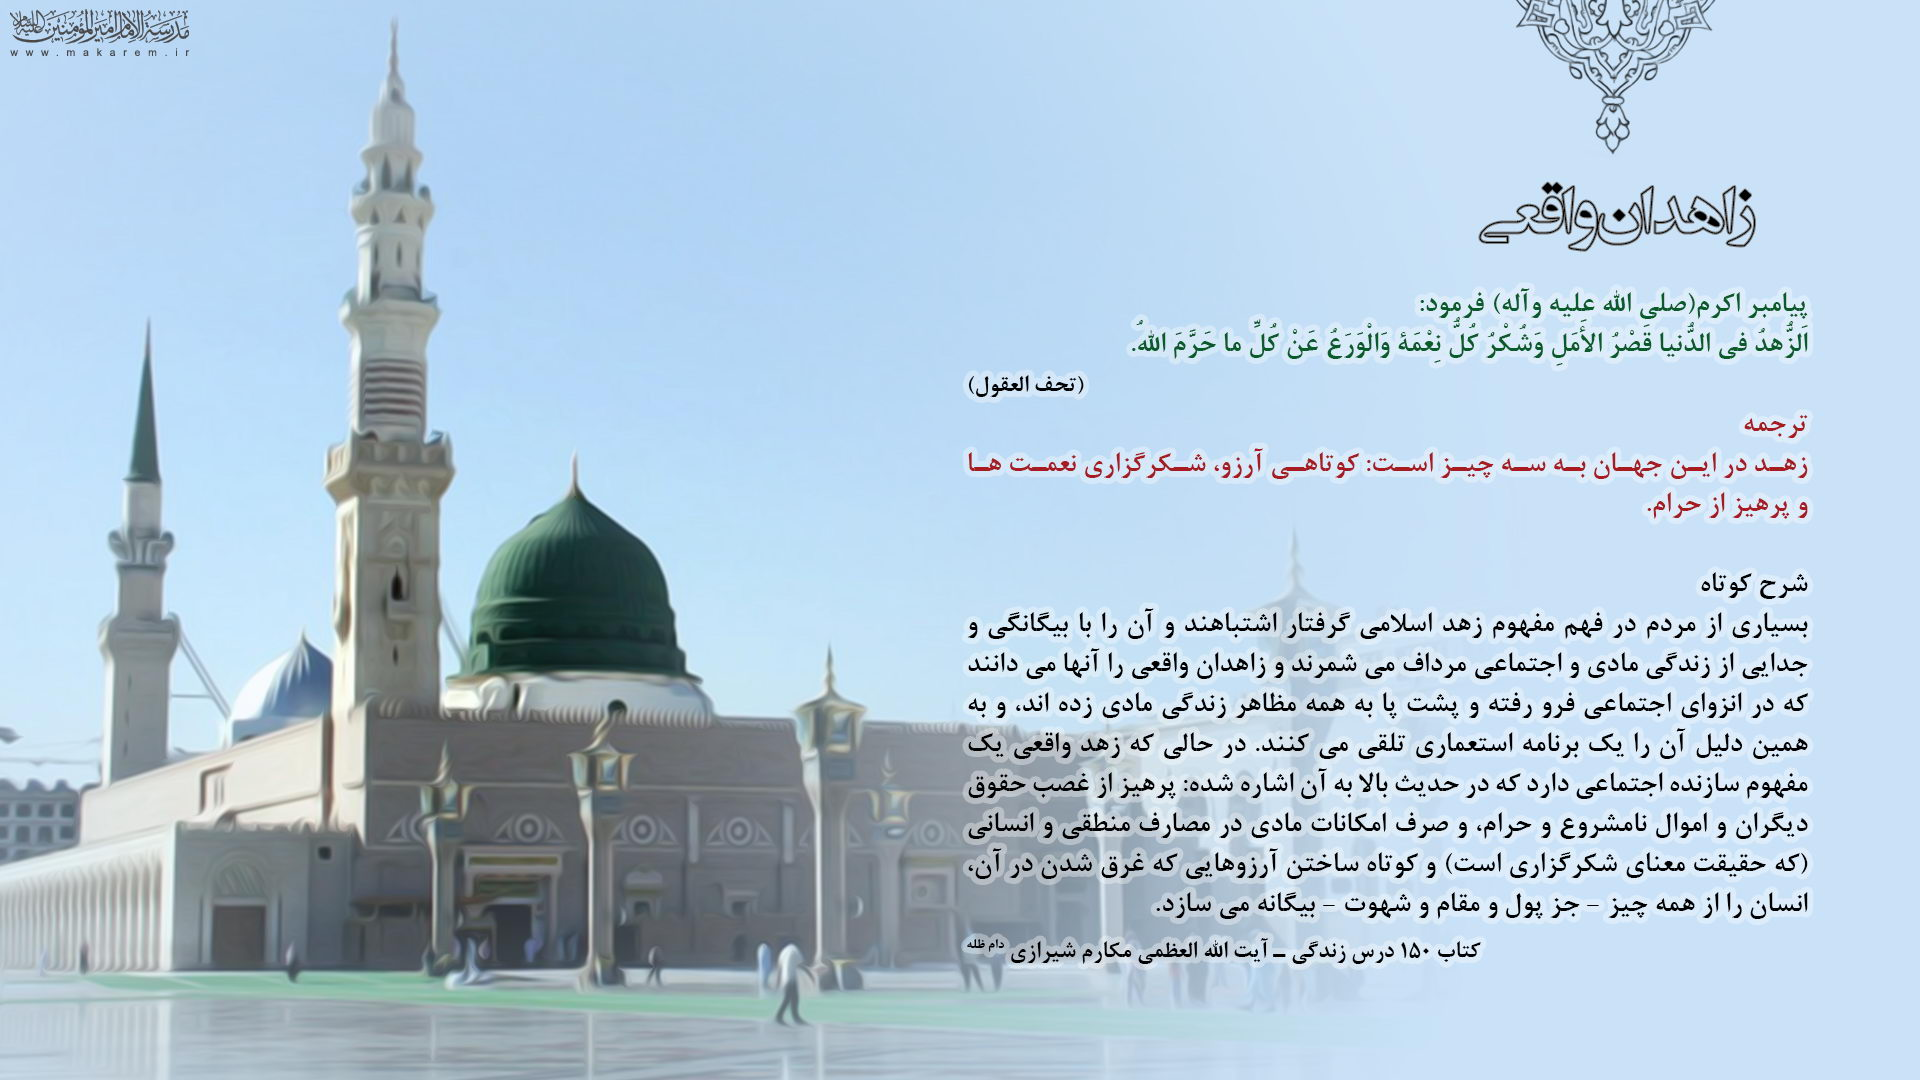 زاهدان واقعی-مدرسه الامام امیر المومنین (ع)